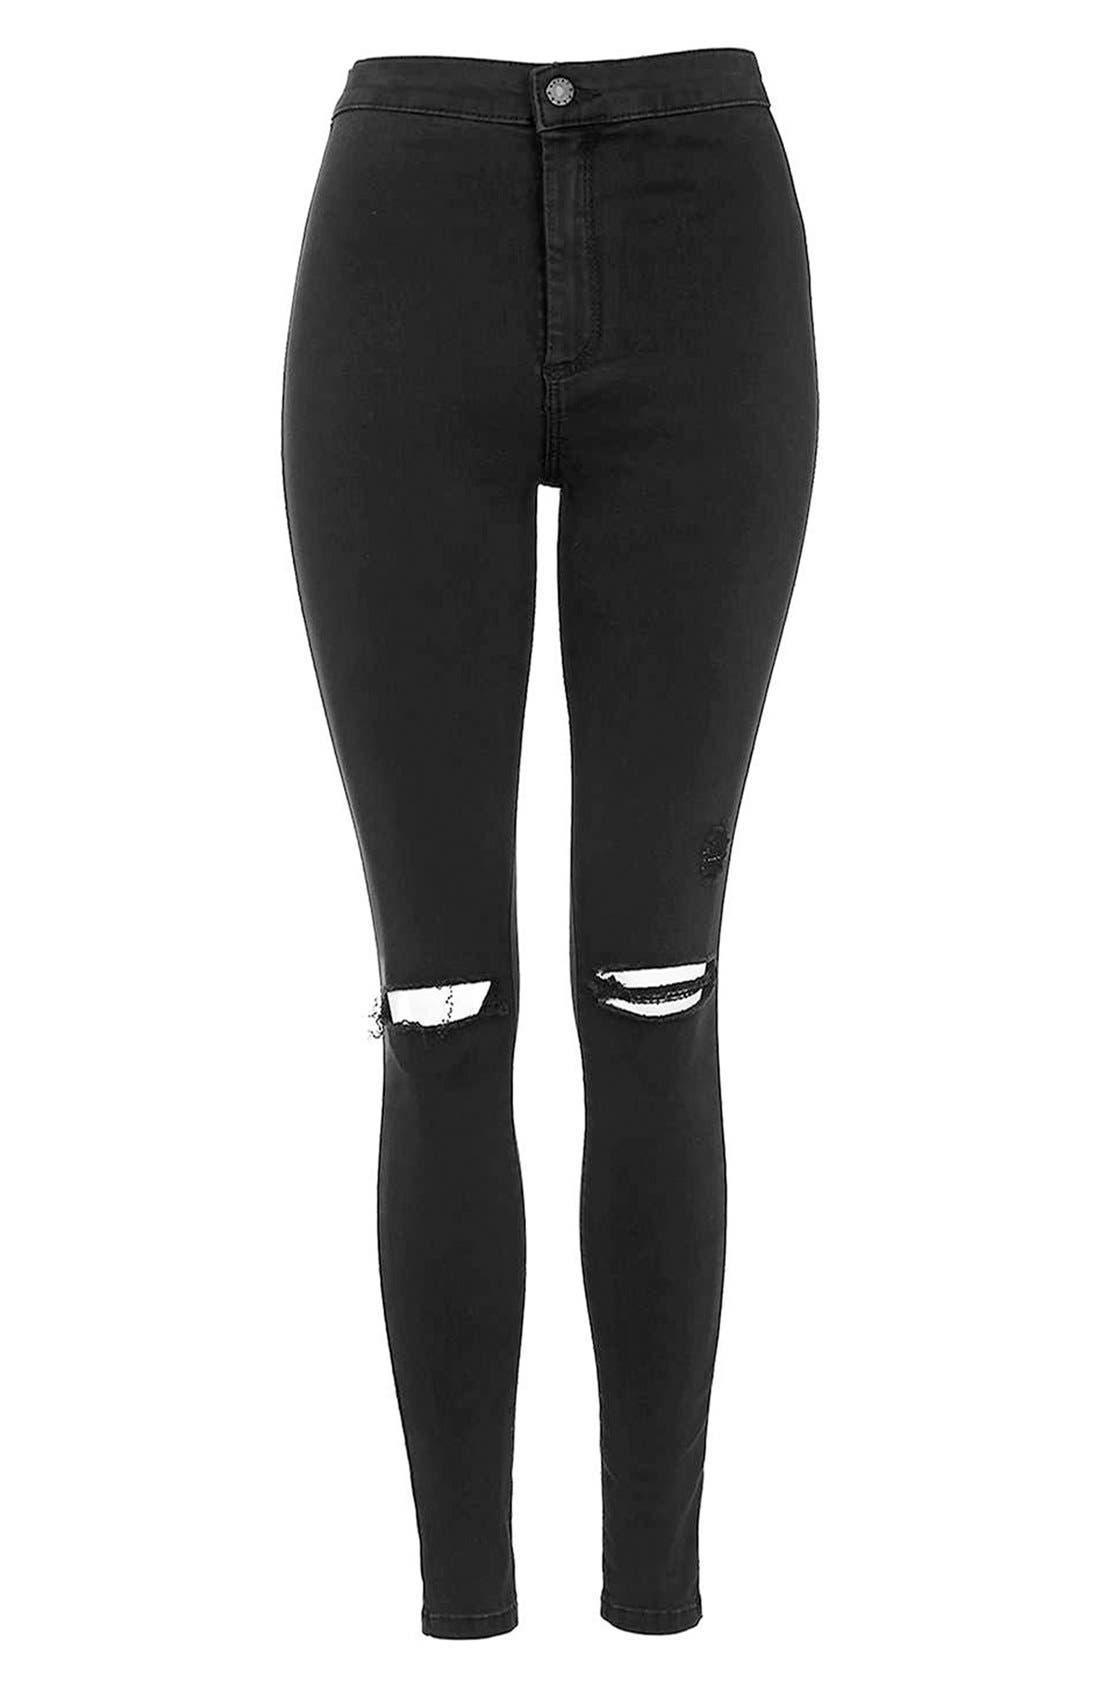 Alternate Image 4  - Topshop Moto 'Joni' Ripped Skinny Jeans (Petite)